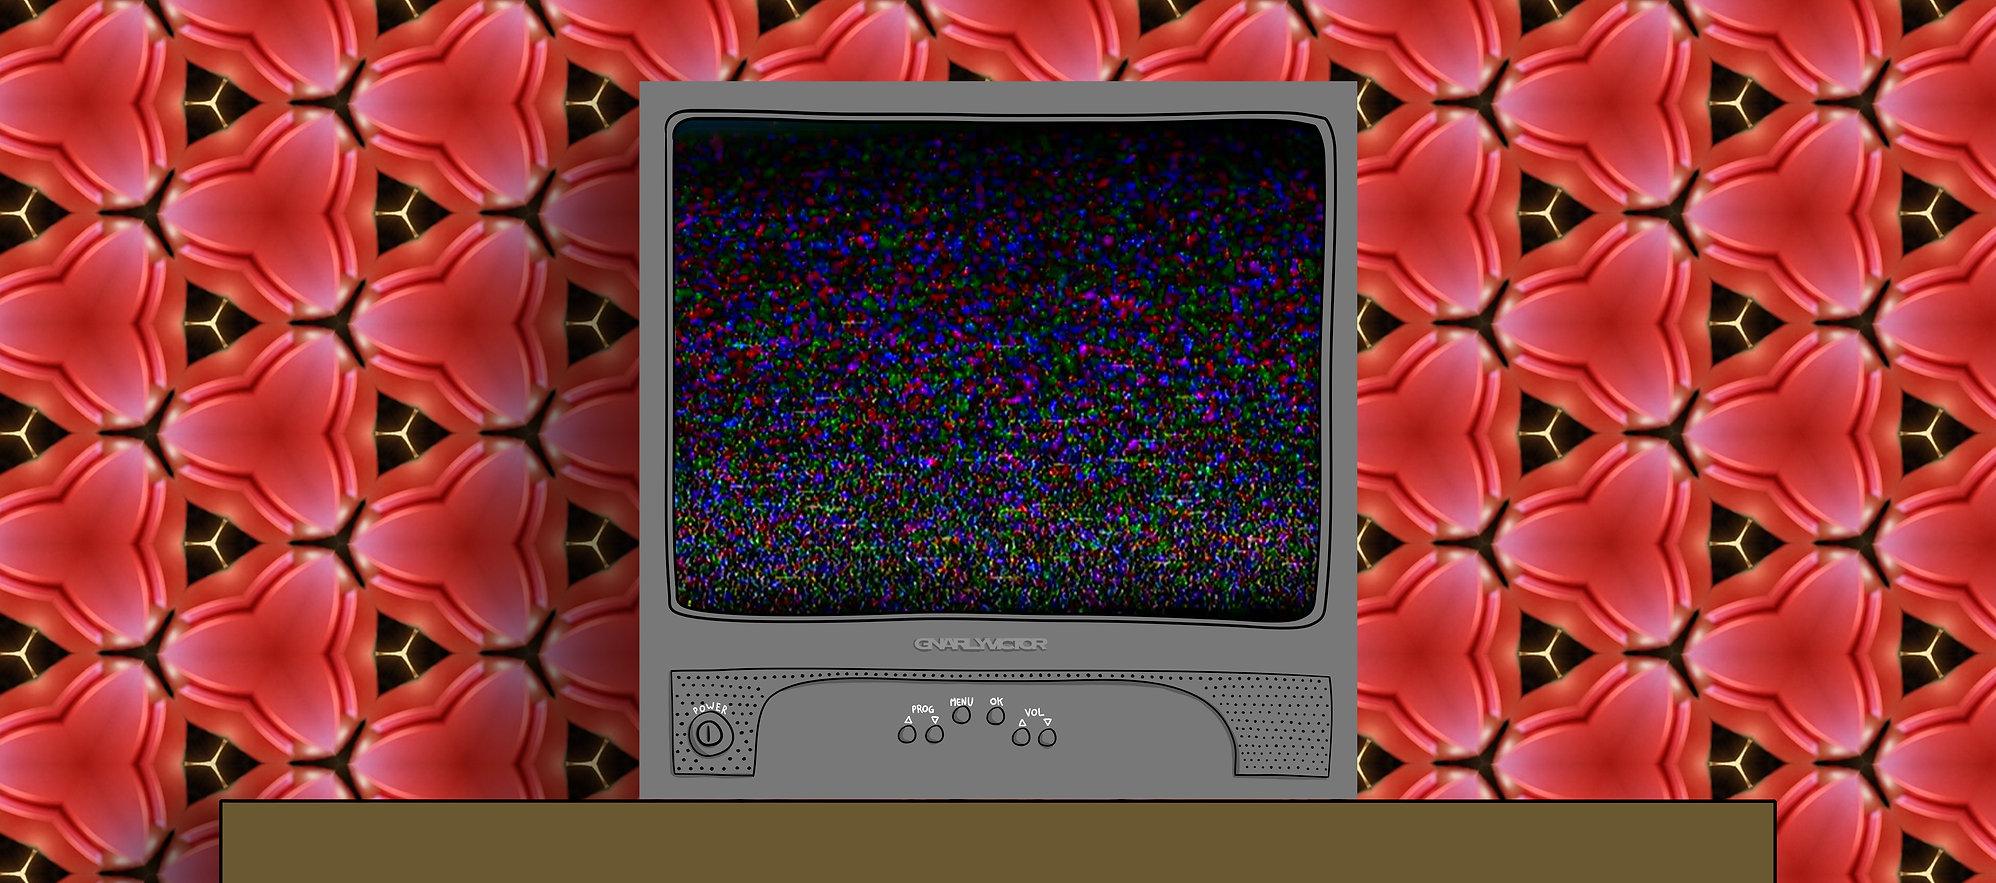 fond tv 2000.jpg